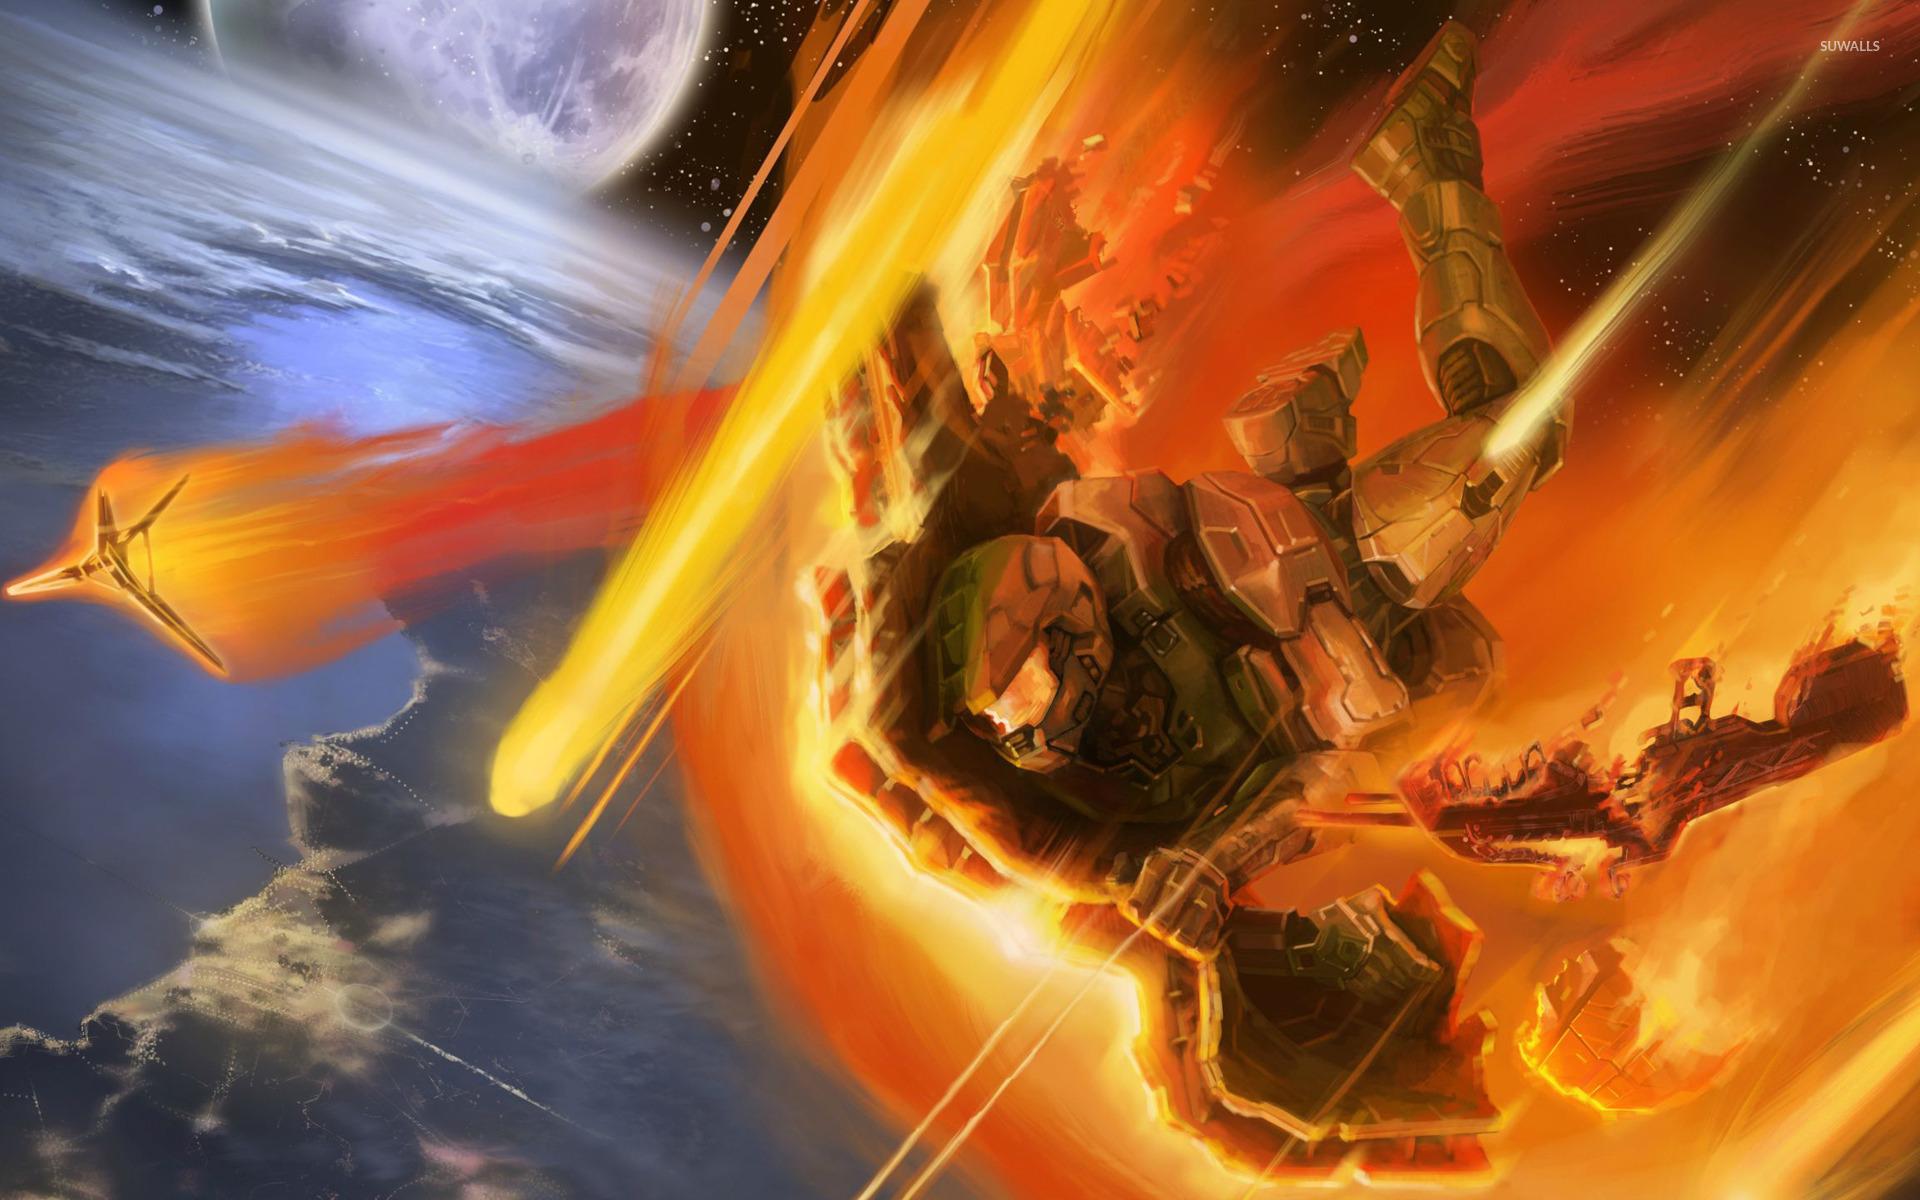 Halo Wars 3 Wallpaper Game Wallpapers 14813